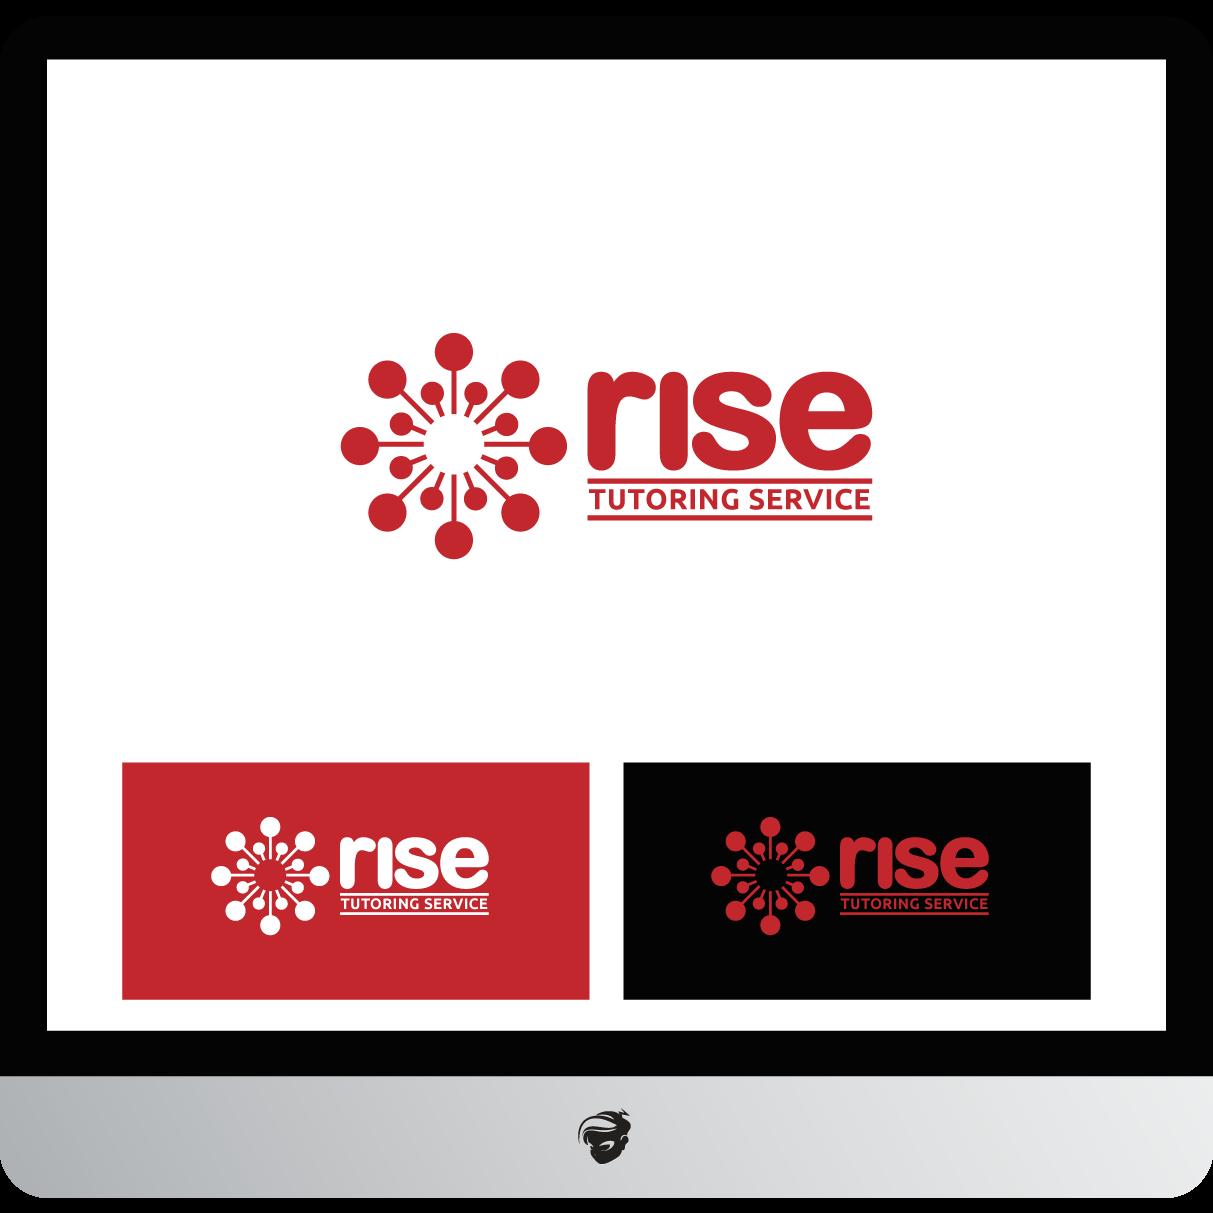 Logo Design by zesthar - Entry No. 247 in the Logo Design Contest Imaginative Logo Design for Rise Tutoring Service.